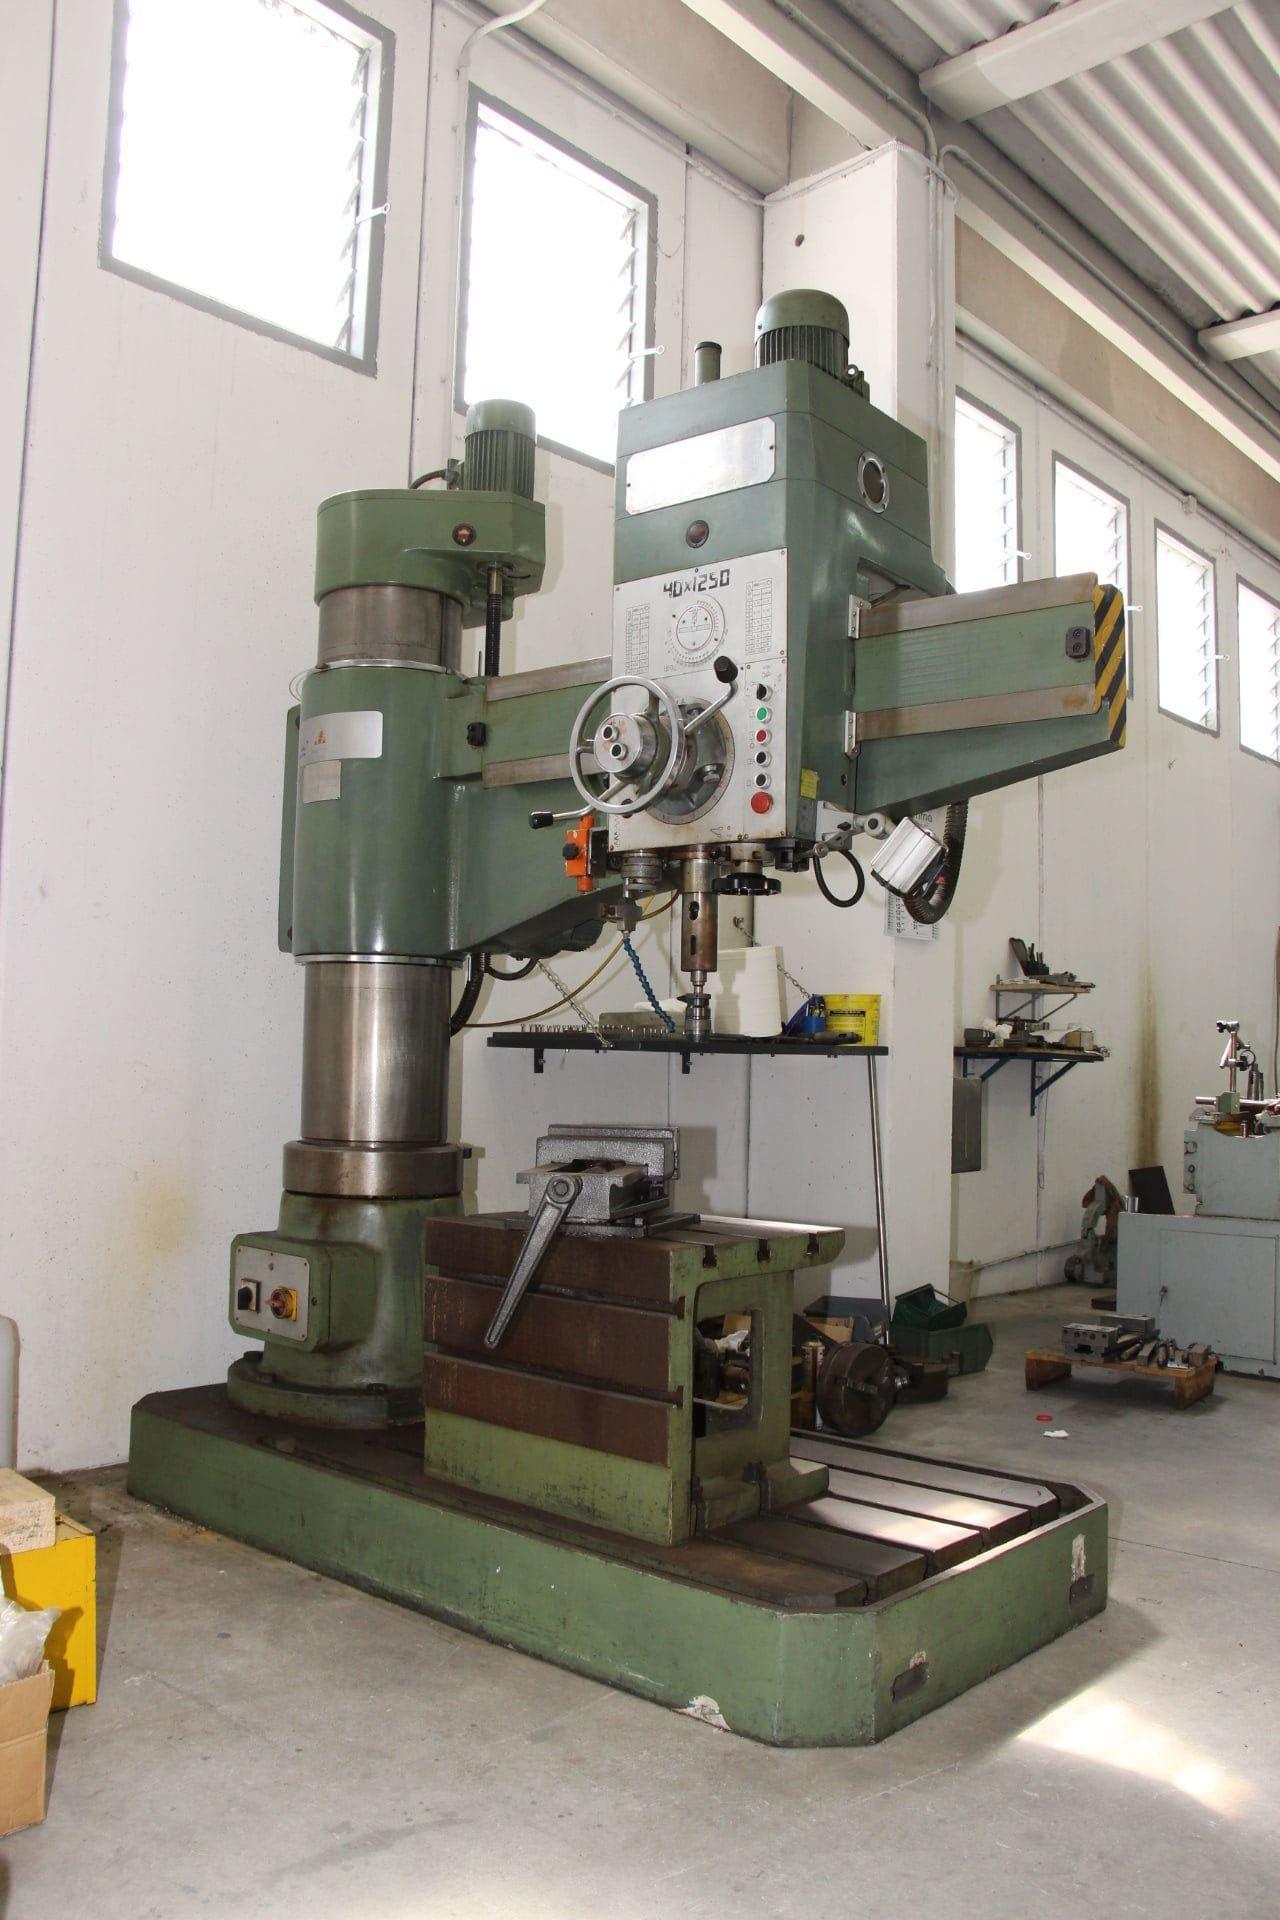 LTF 40x1250 Radialbohrmaschine